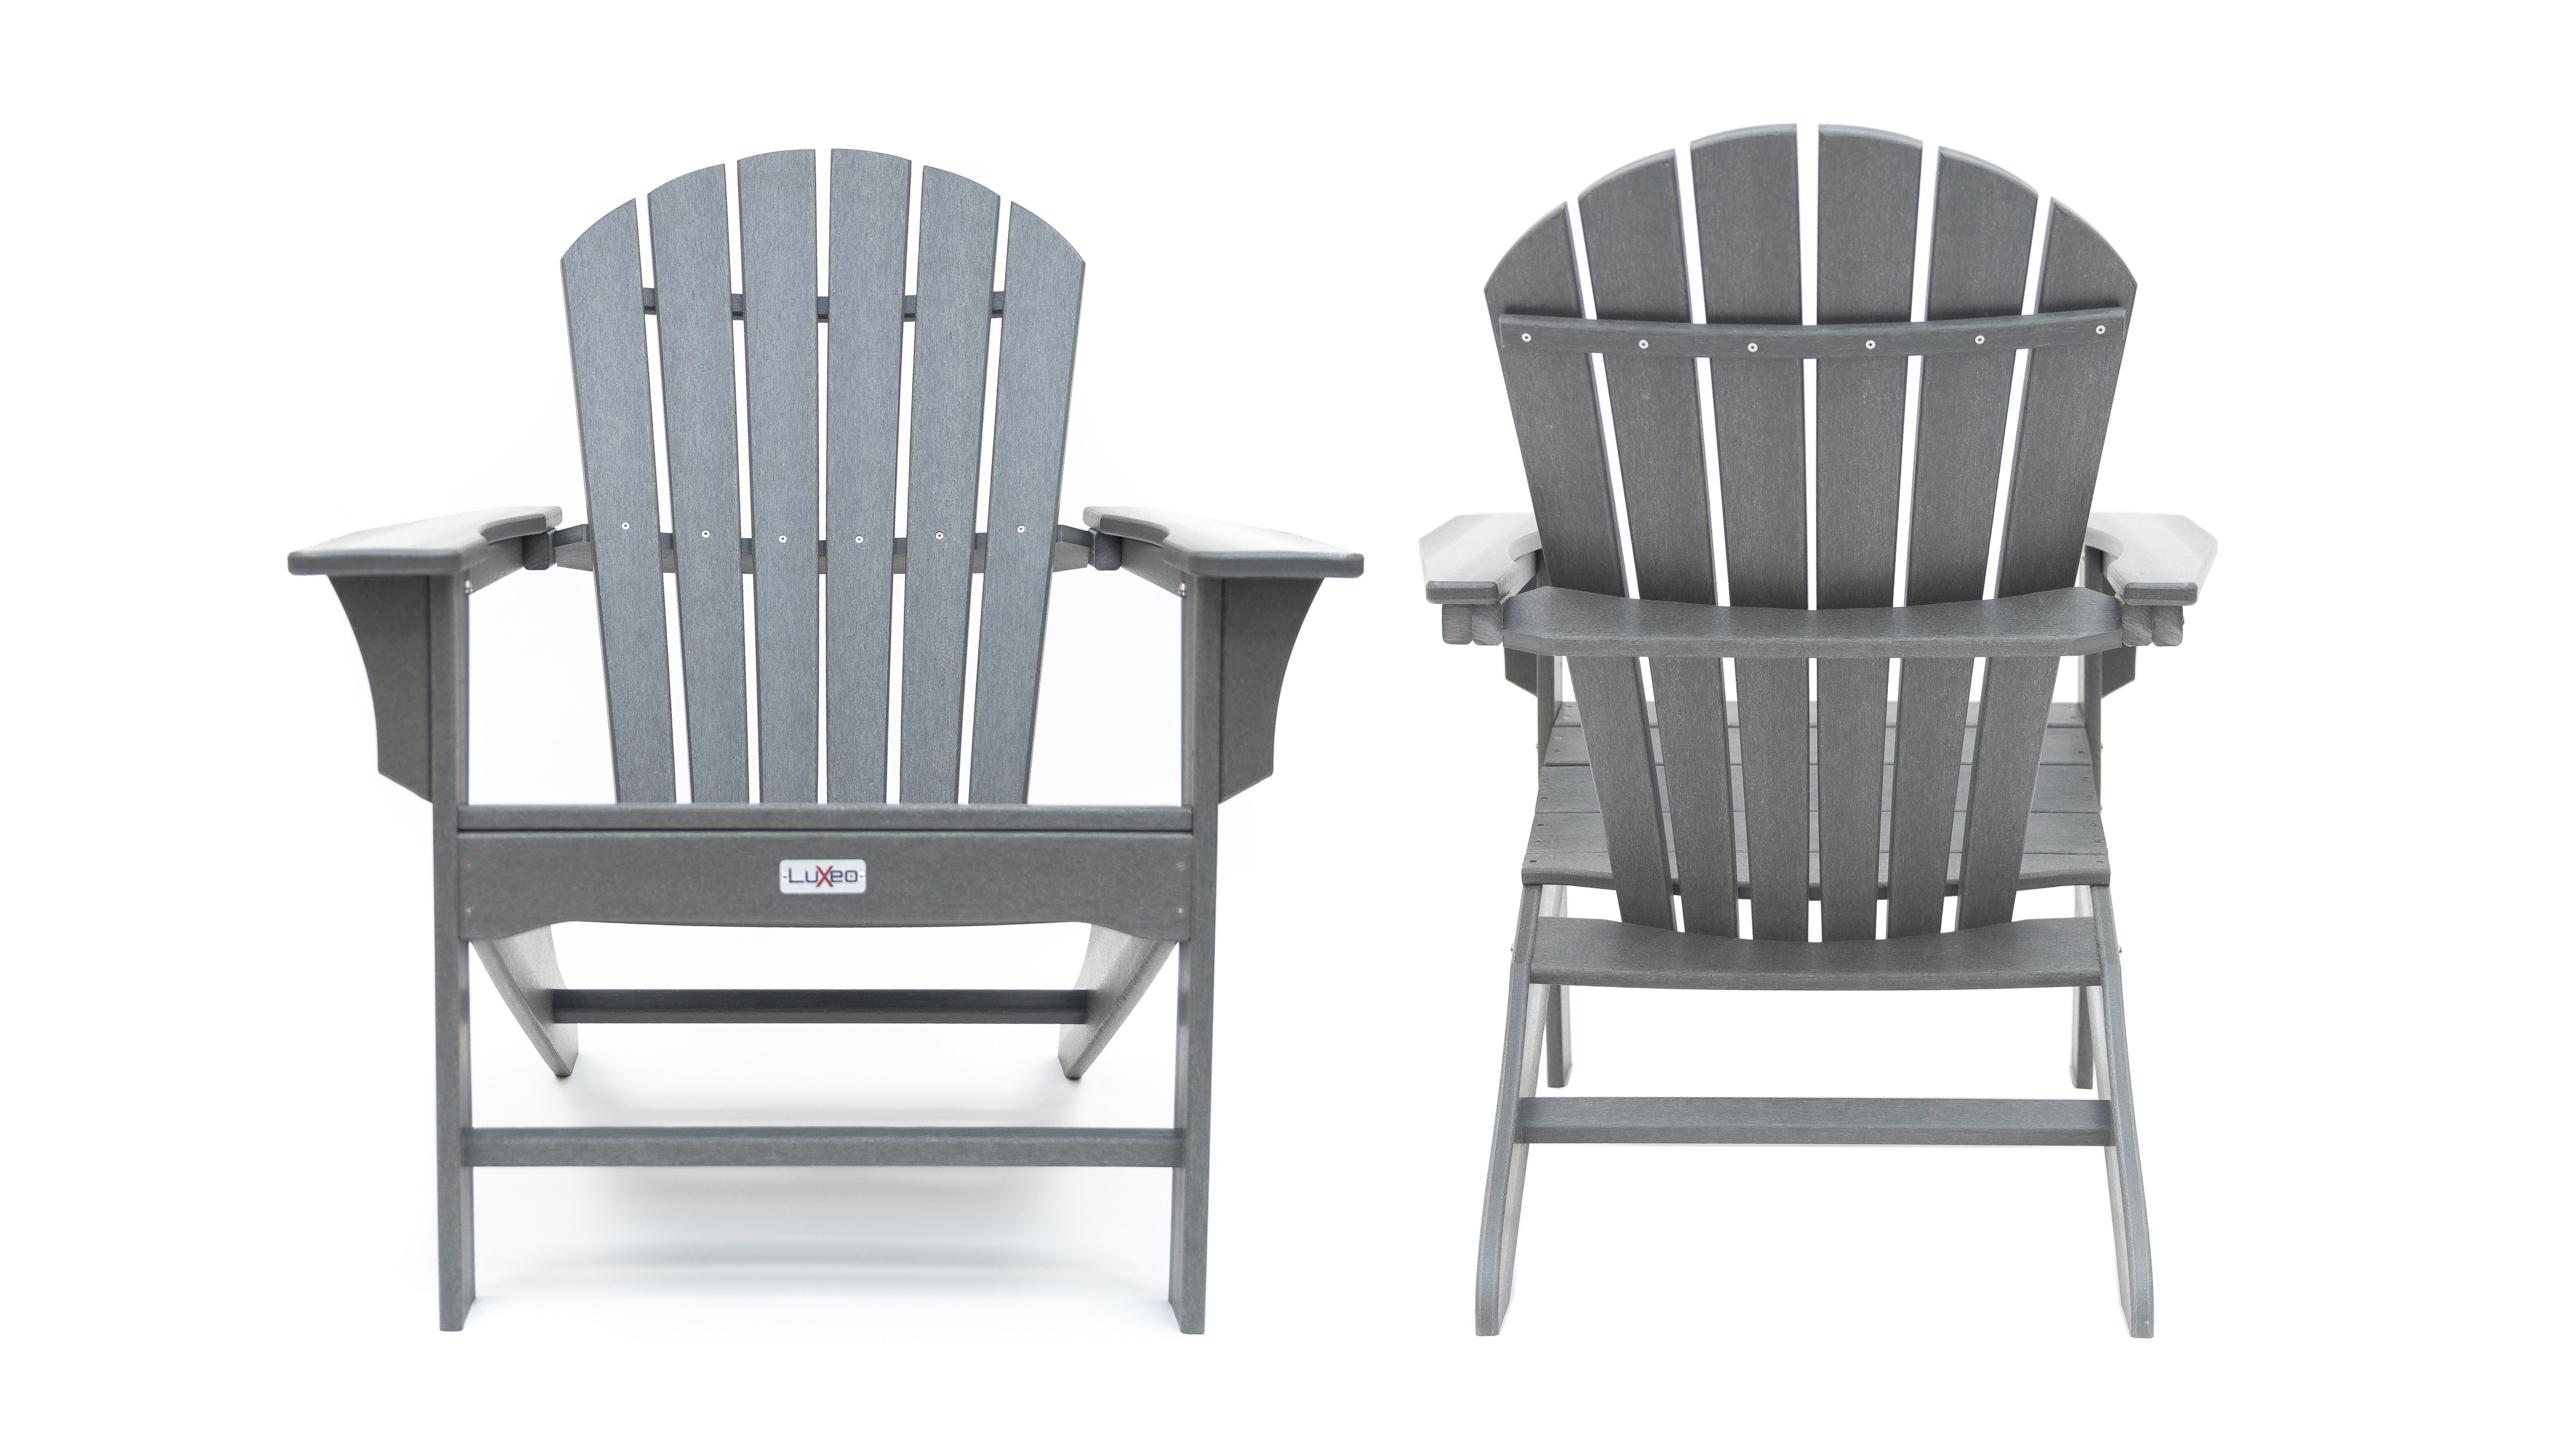 Corinne Poly Plastic Adirondack Chair (Set of 2)  sc 1 st  Visual Hunt & Recycled Plastic Adirondack Chairs - Visual Hunt